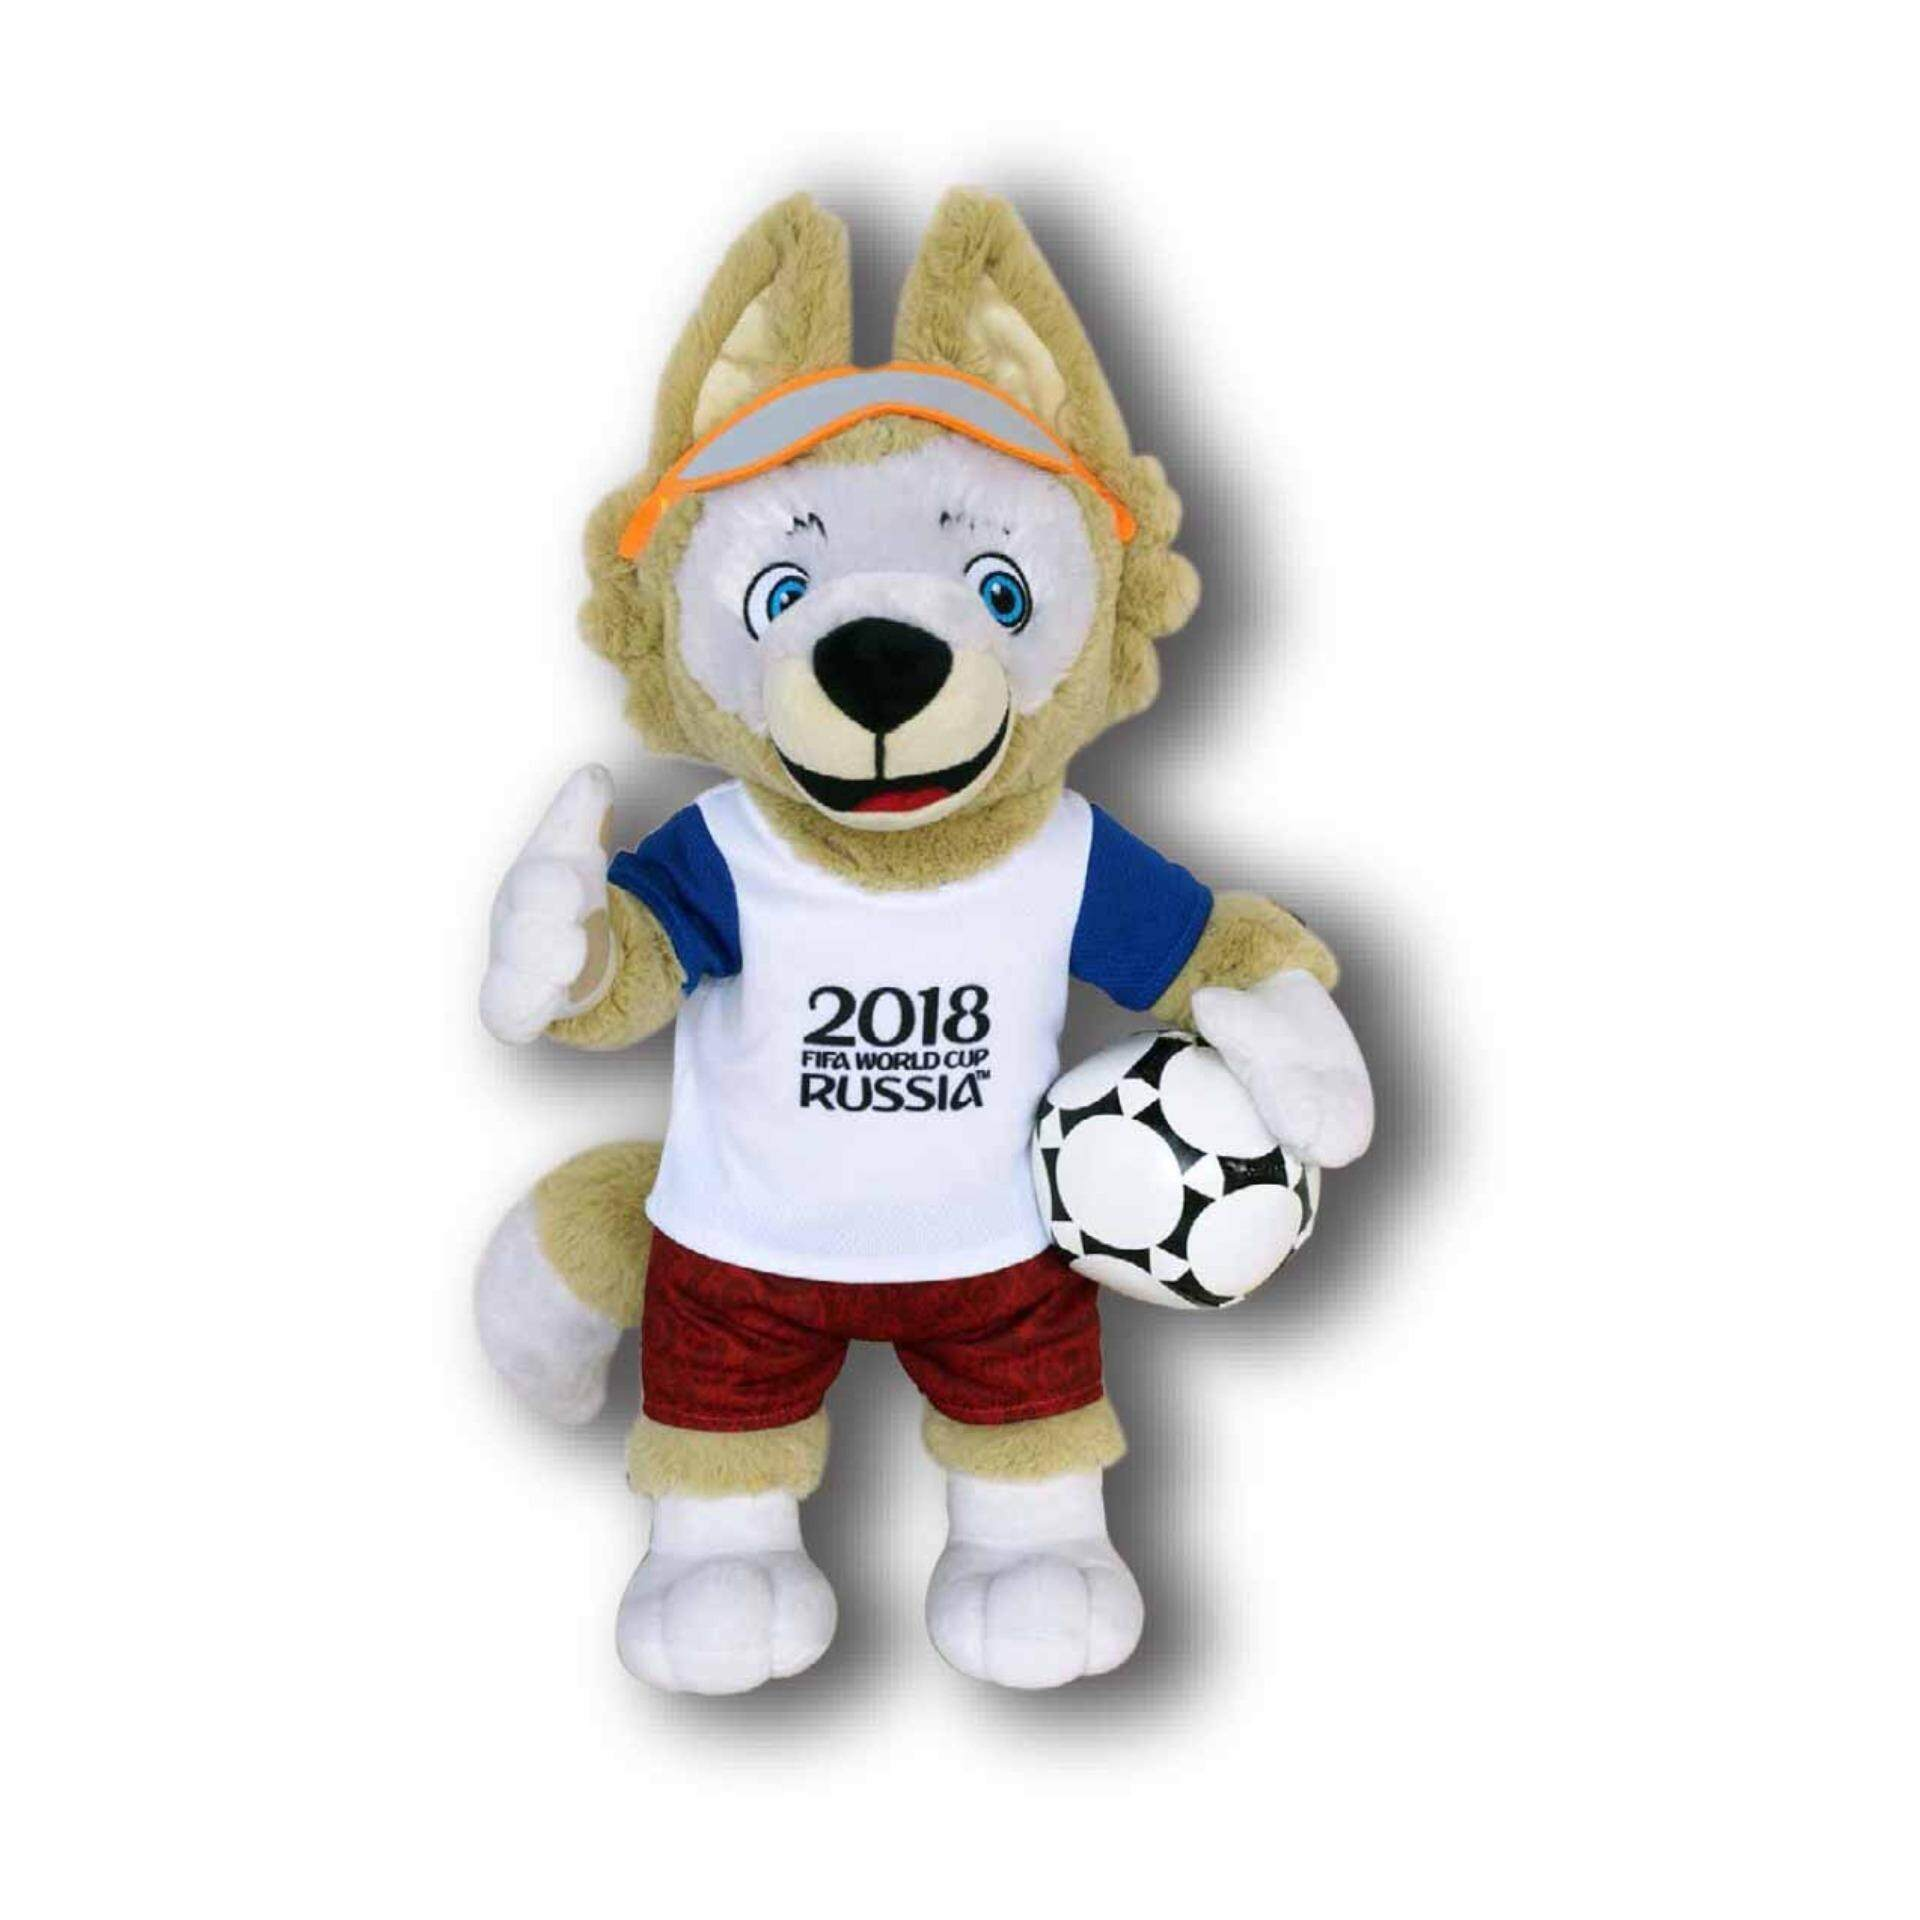 "2018 FIFA WORLD CUP RUSSIA ตุ๊กตา ซาบิวากา ขนาดความสูง 10"" สวมชุดฟุตบอลโลก 2018 (เล็ก)"